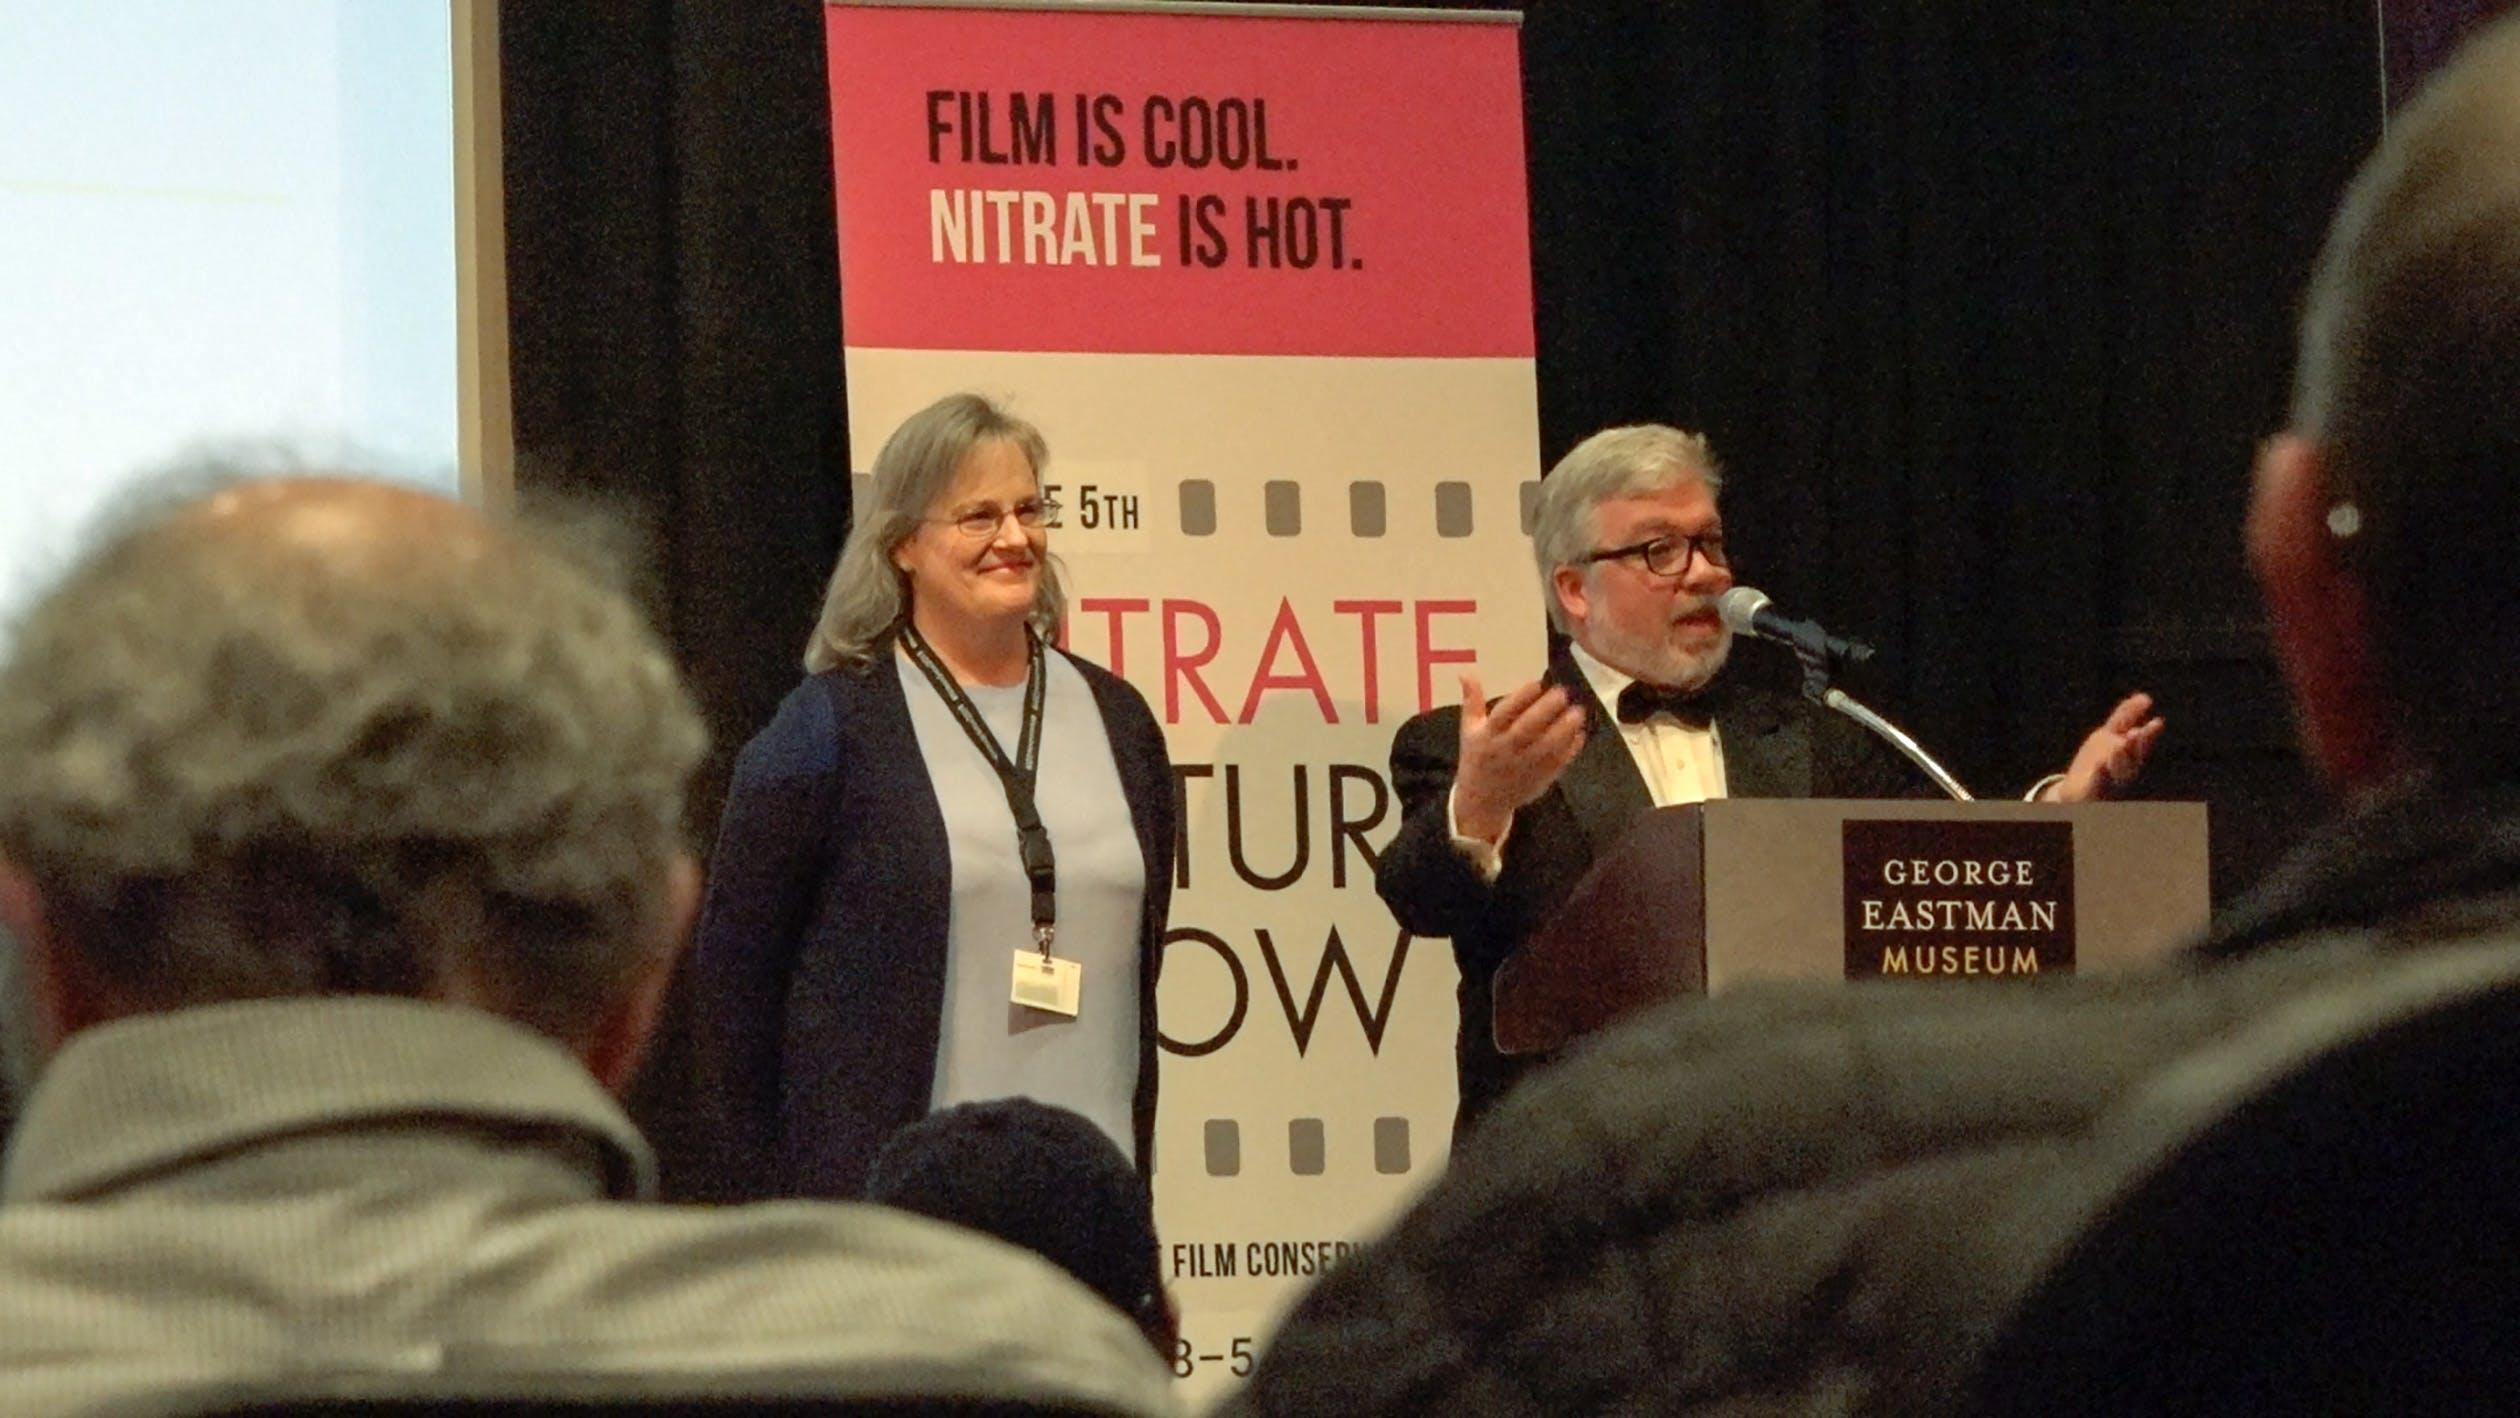 Deborah Stoiber and Jared Case